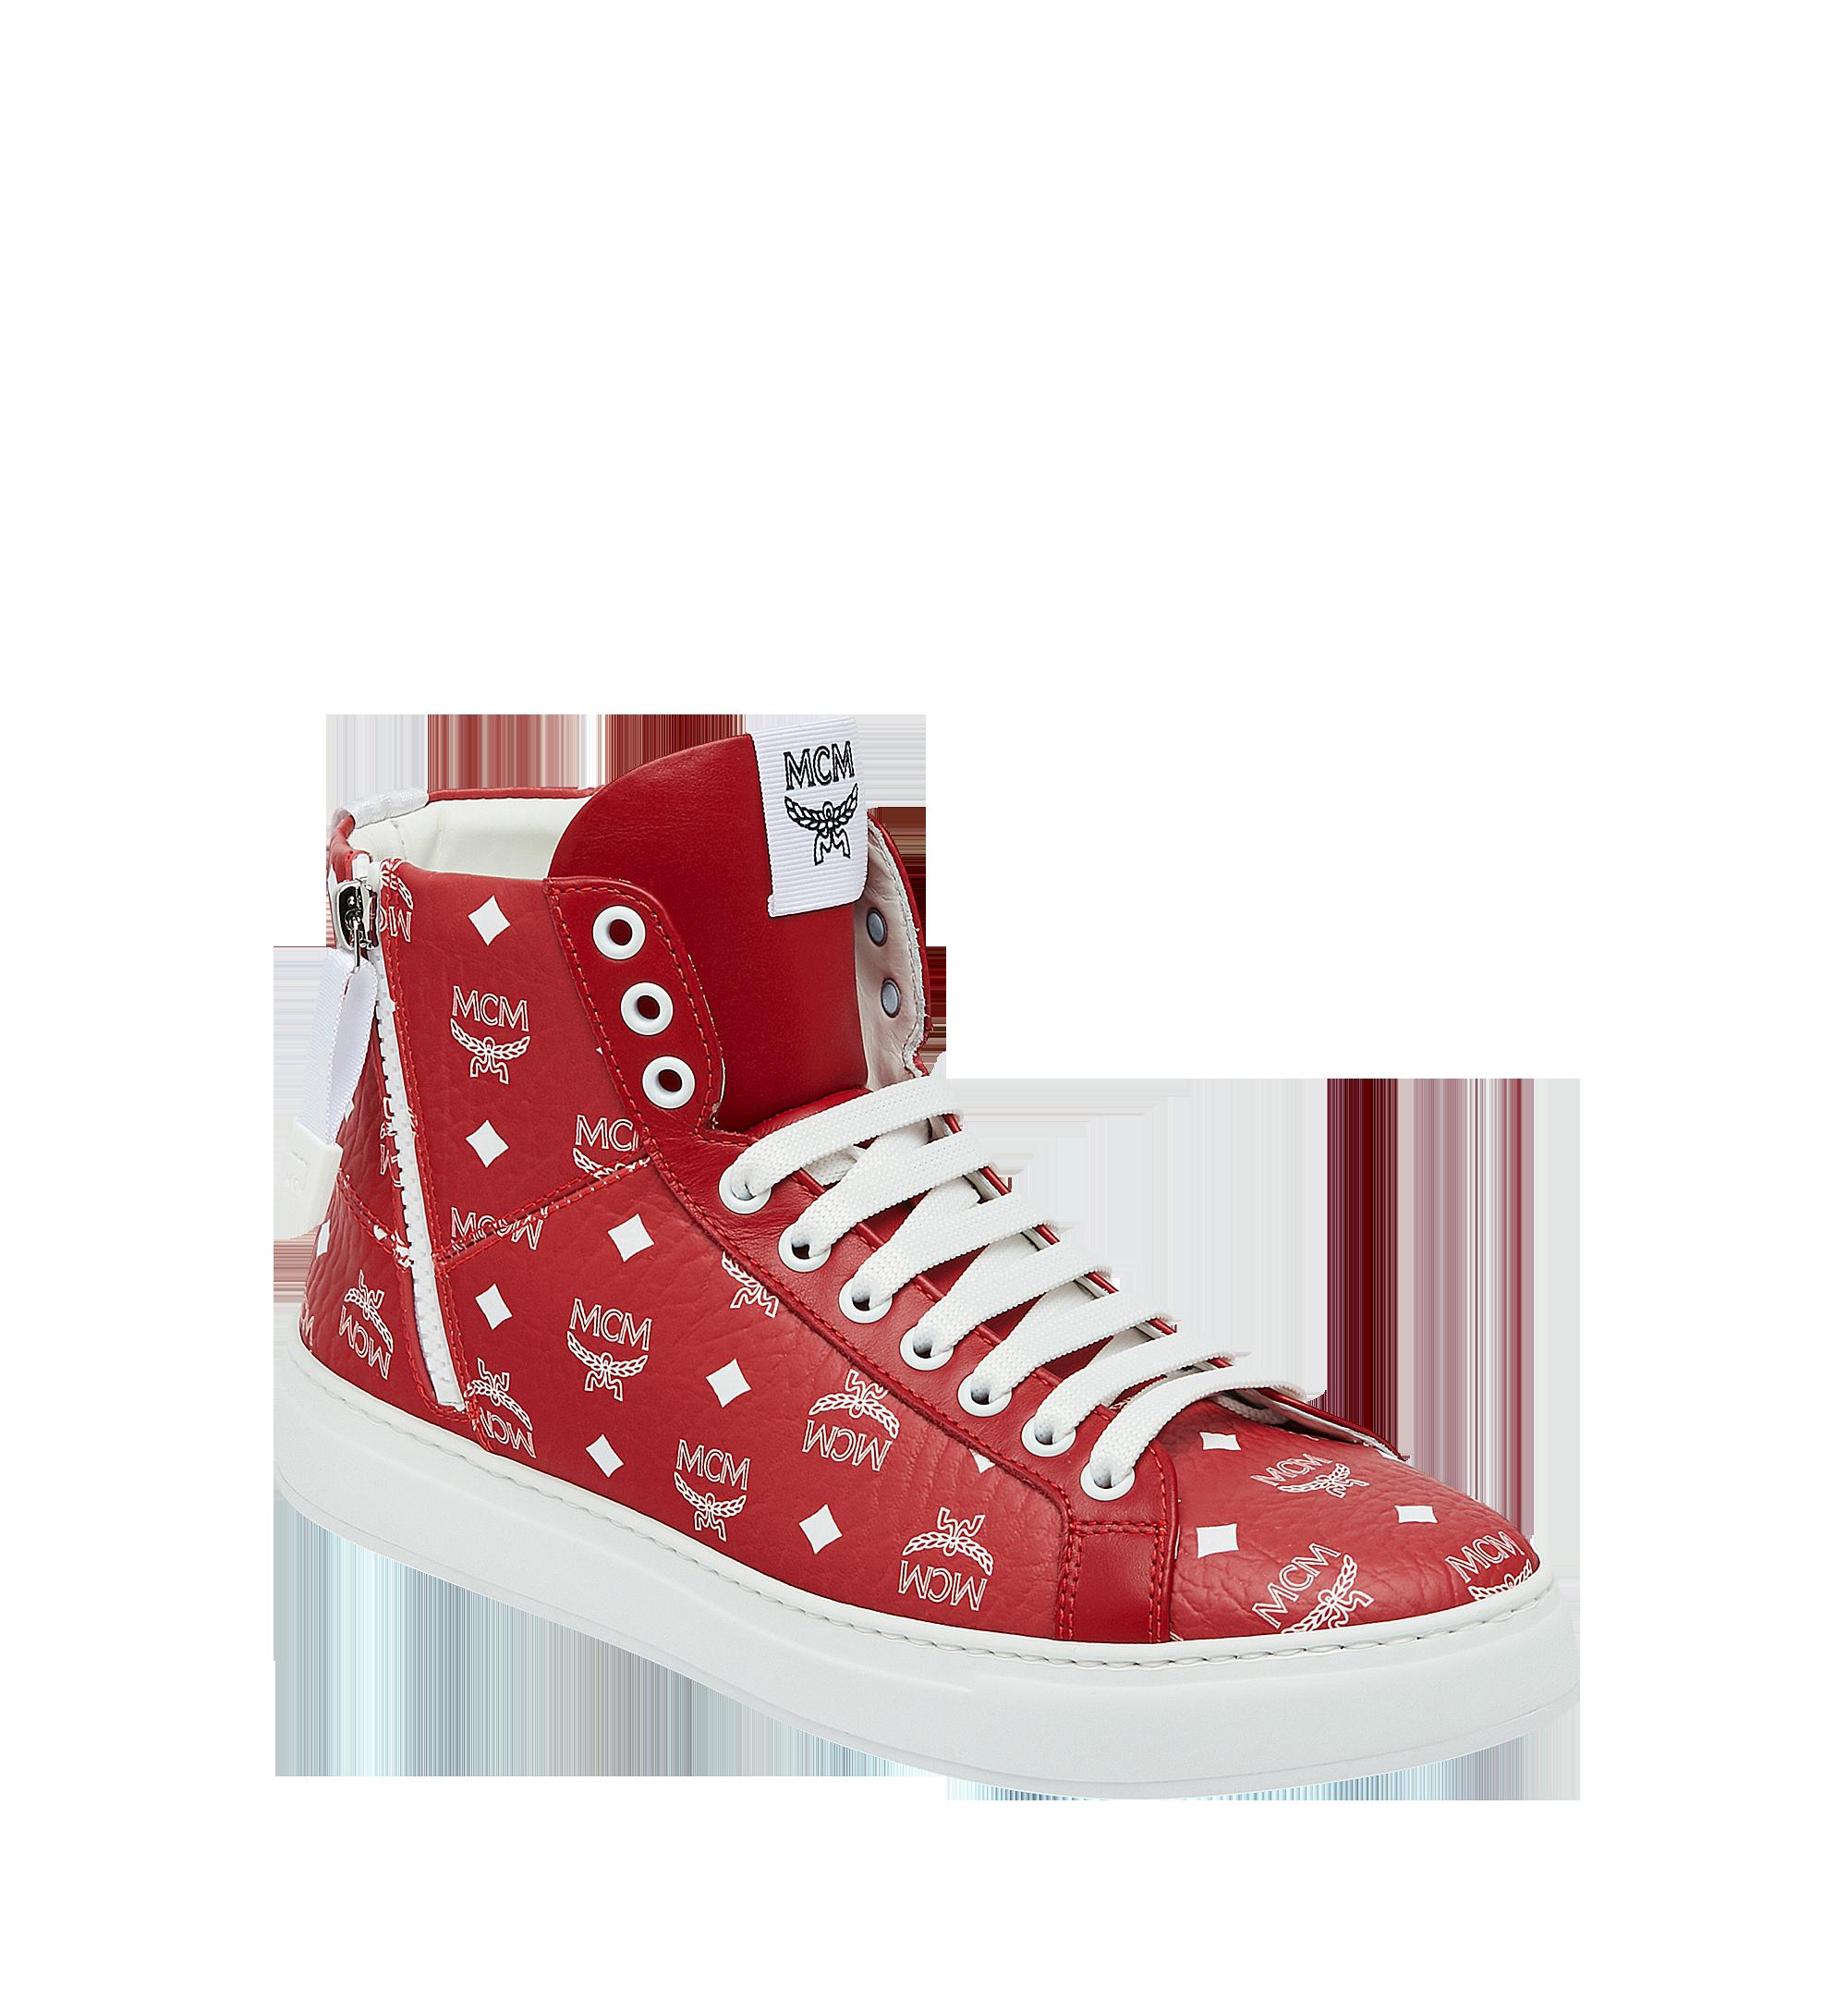 845a3b4f32c Men's High Top Sneakers In White Logo Visetos in White Logo Viva Red